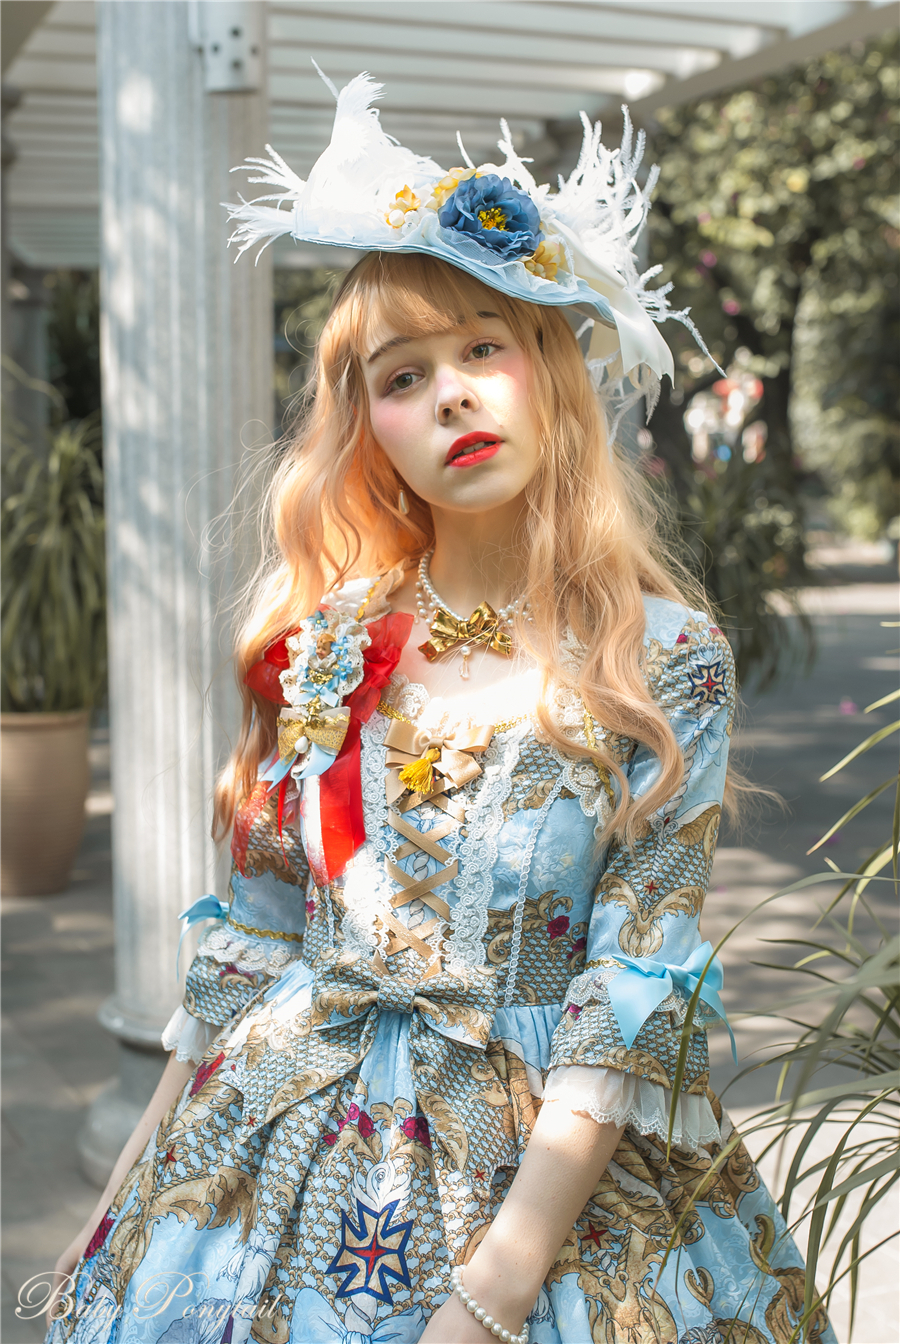 Circus Princess_Sax_OP_Claudia_11.jpg